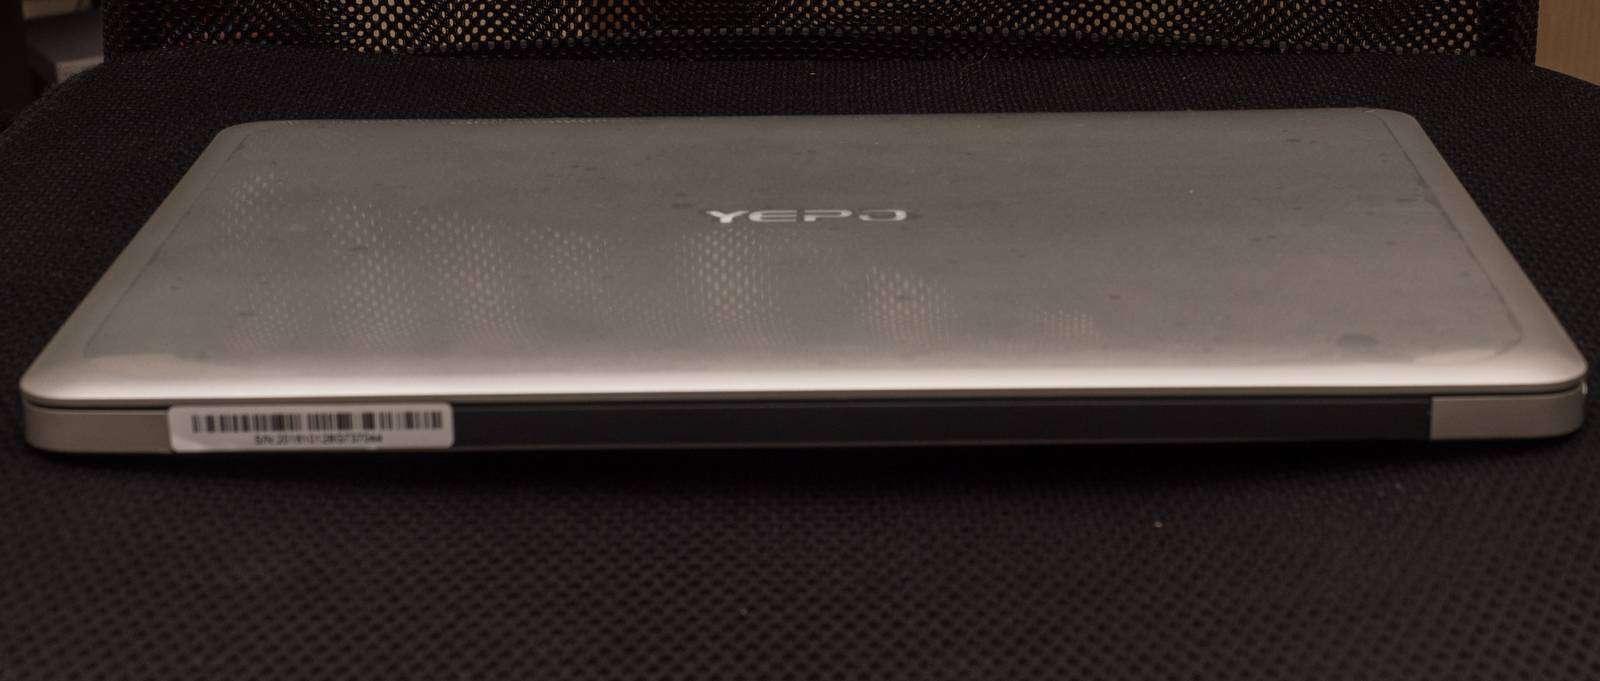 GearBest: Обзор ноутбука YEPO 737S - китайского клона макбука